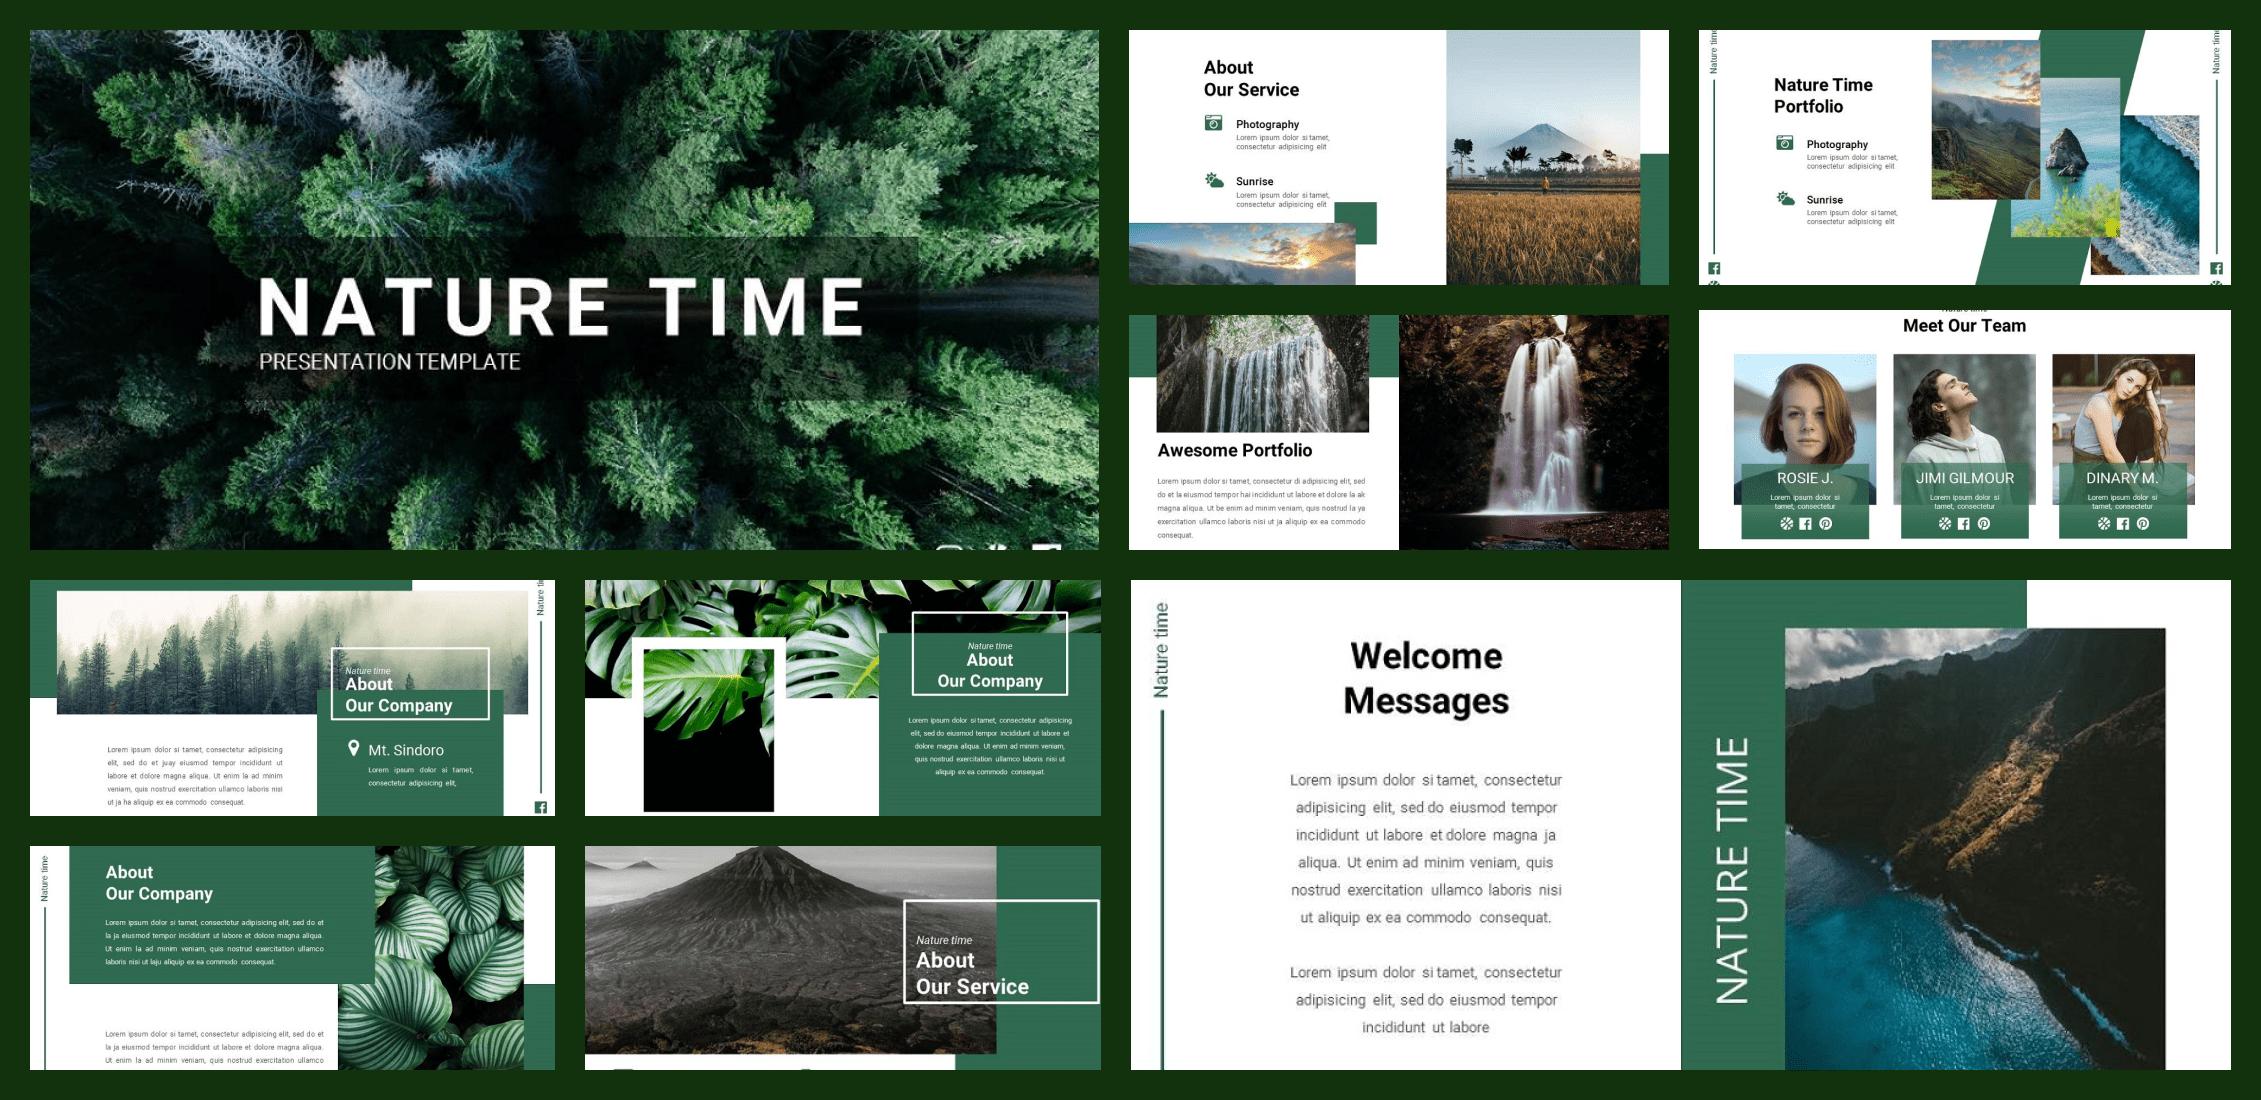 50+ Free and Premium Simple Google Slides Themes in 2021 - simple google slides theme 23